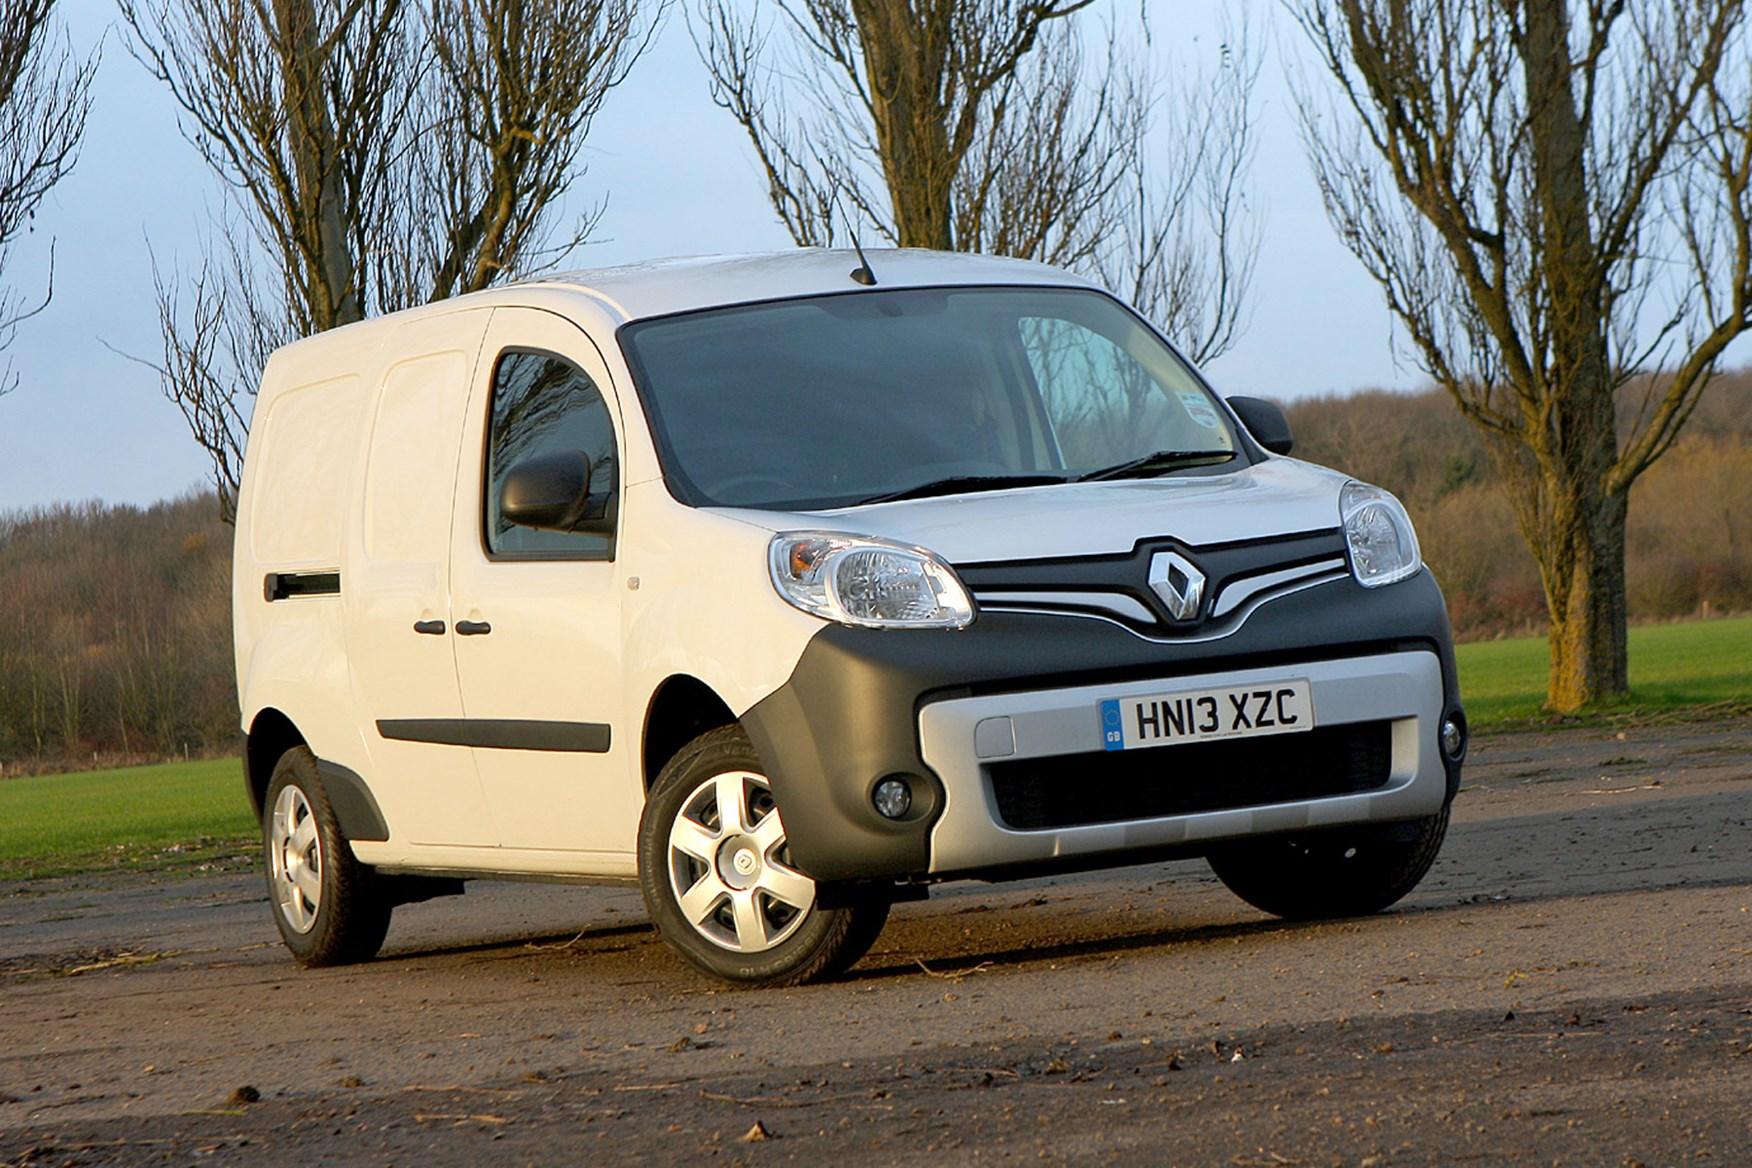 Renault Kangoo Maxi Sport review - front view, white